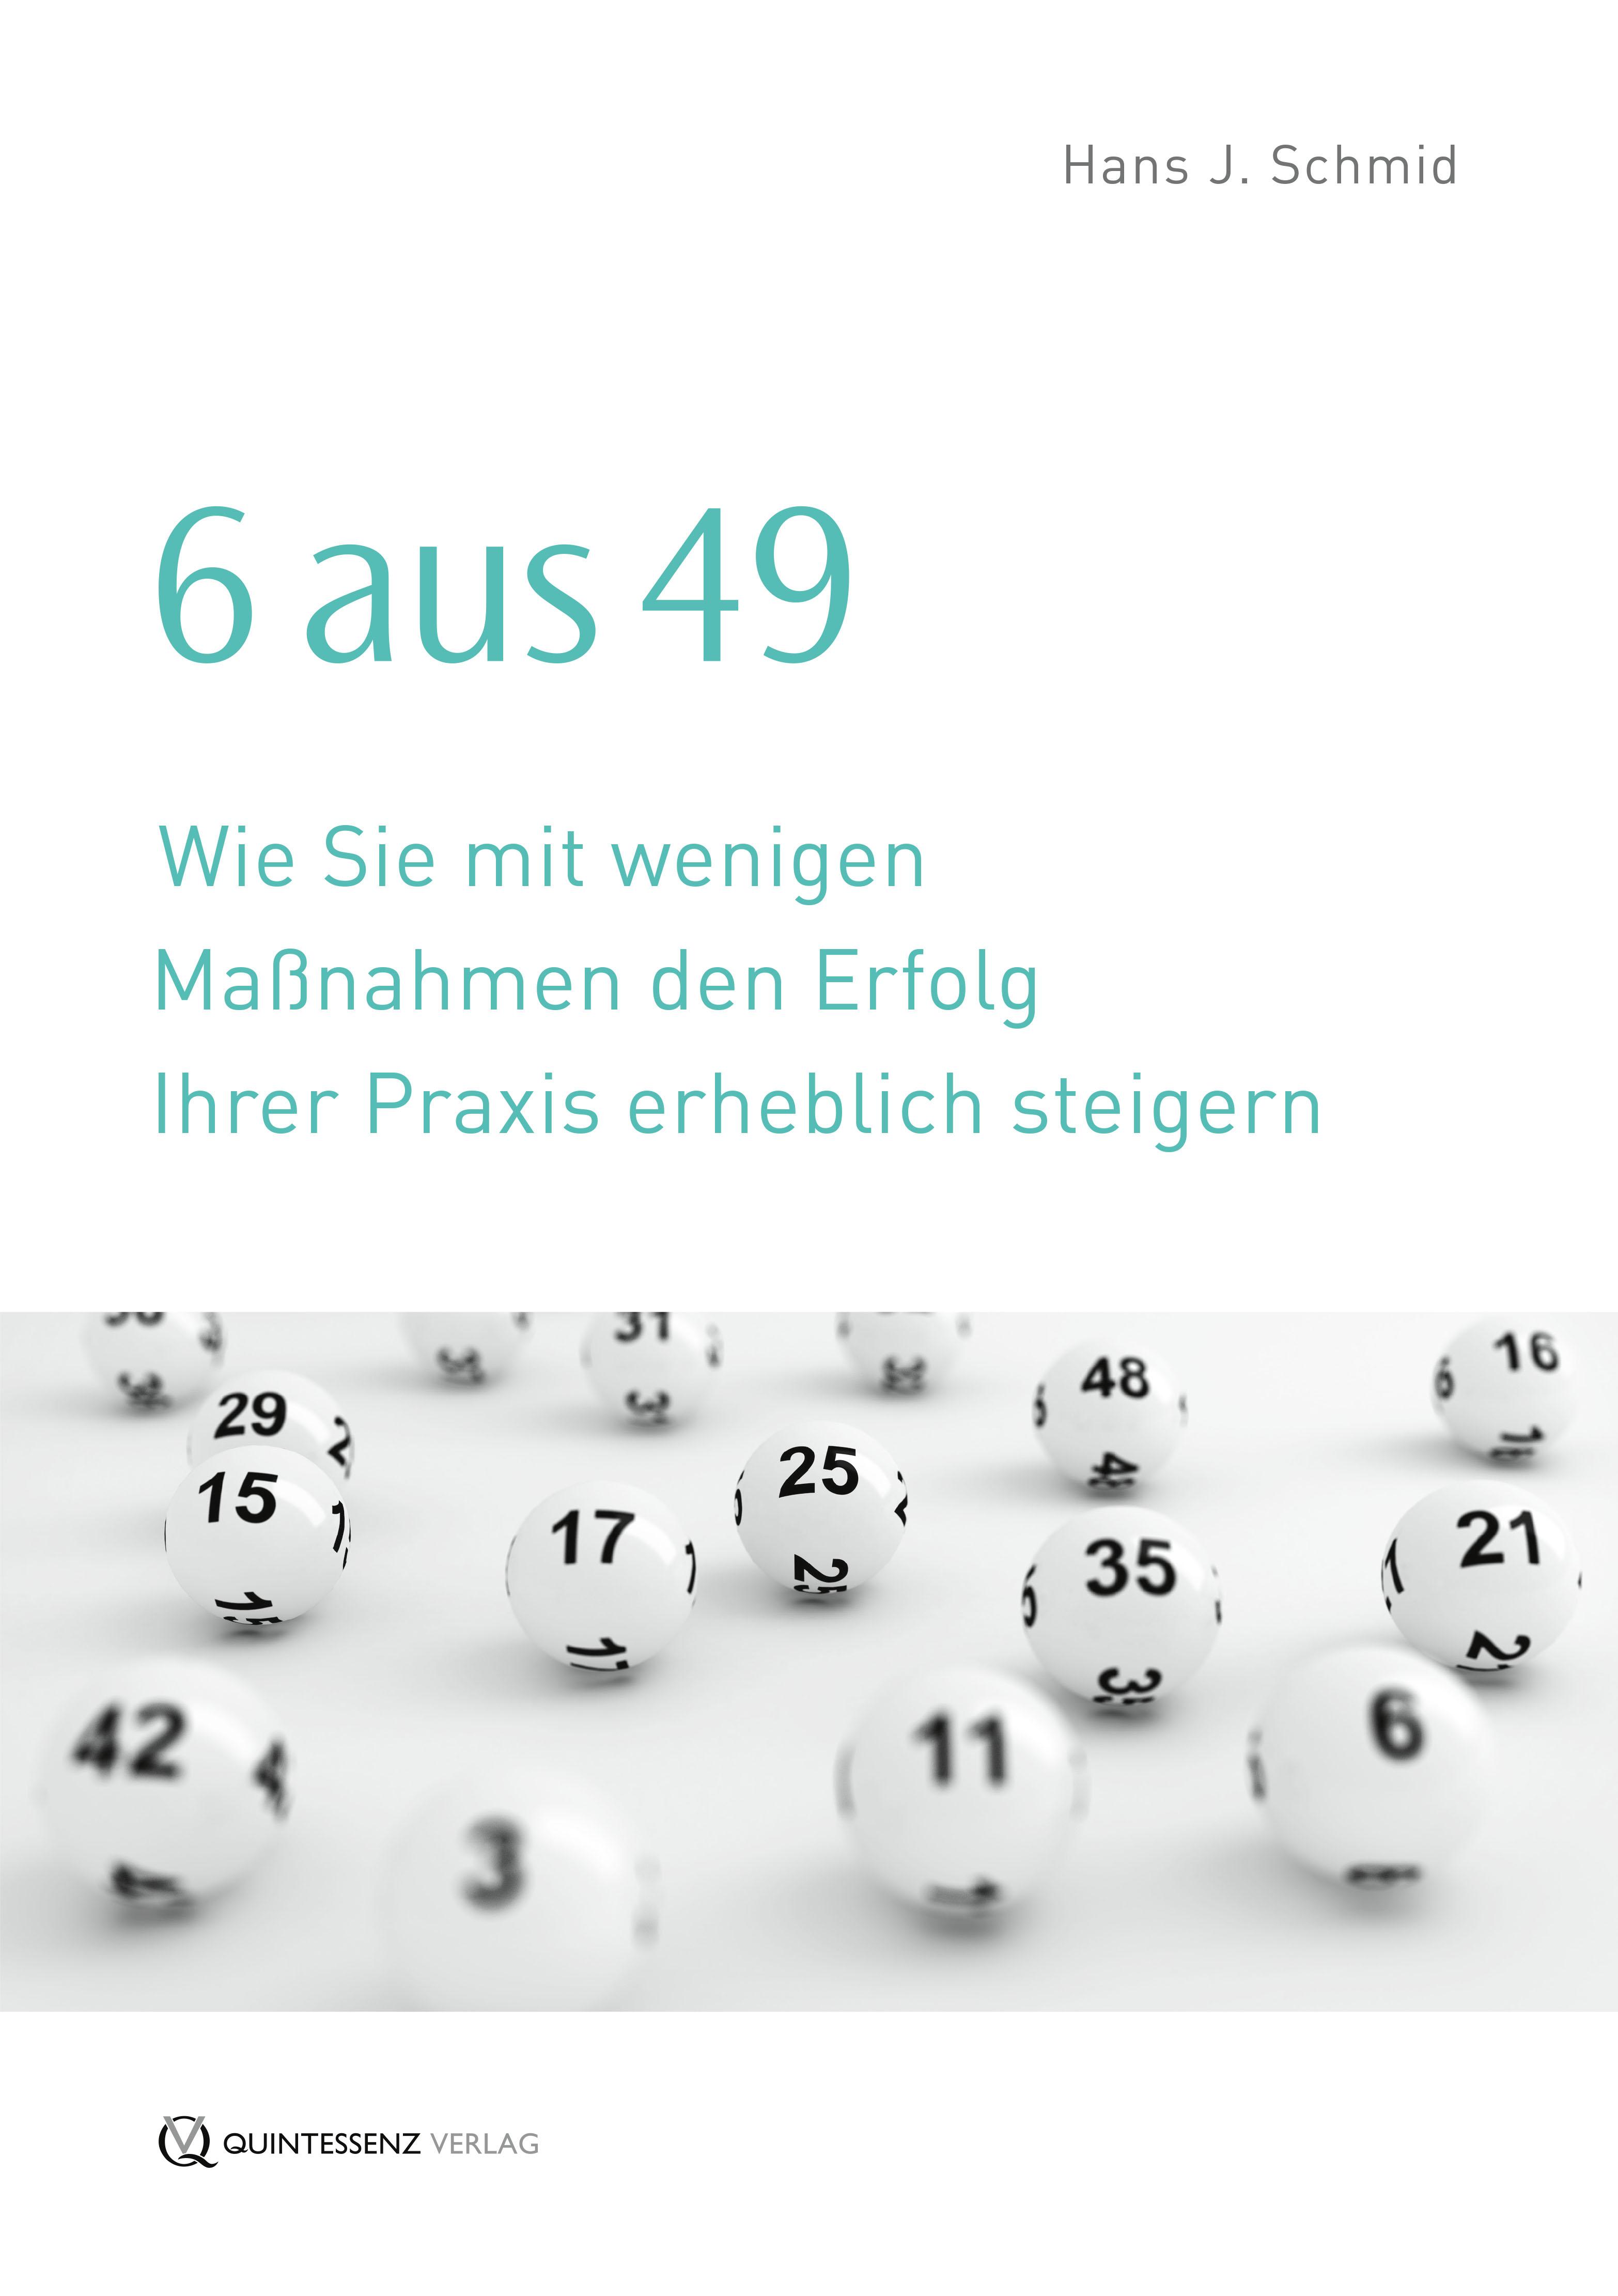 Hans J. Schmid 6 aus 49